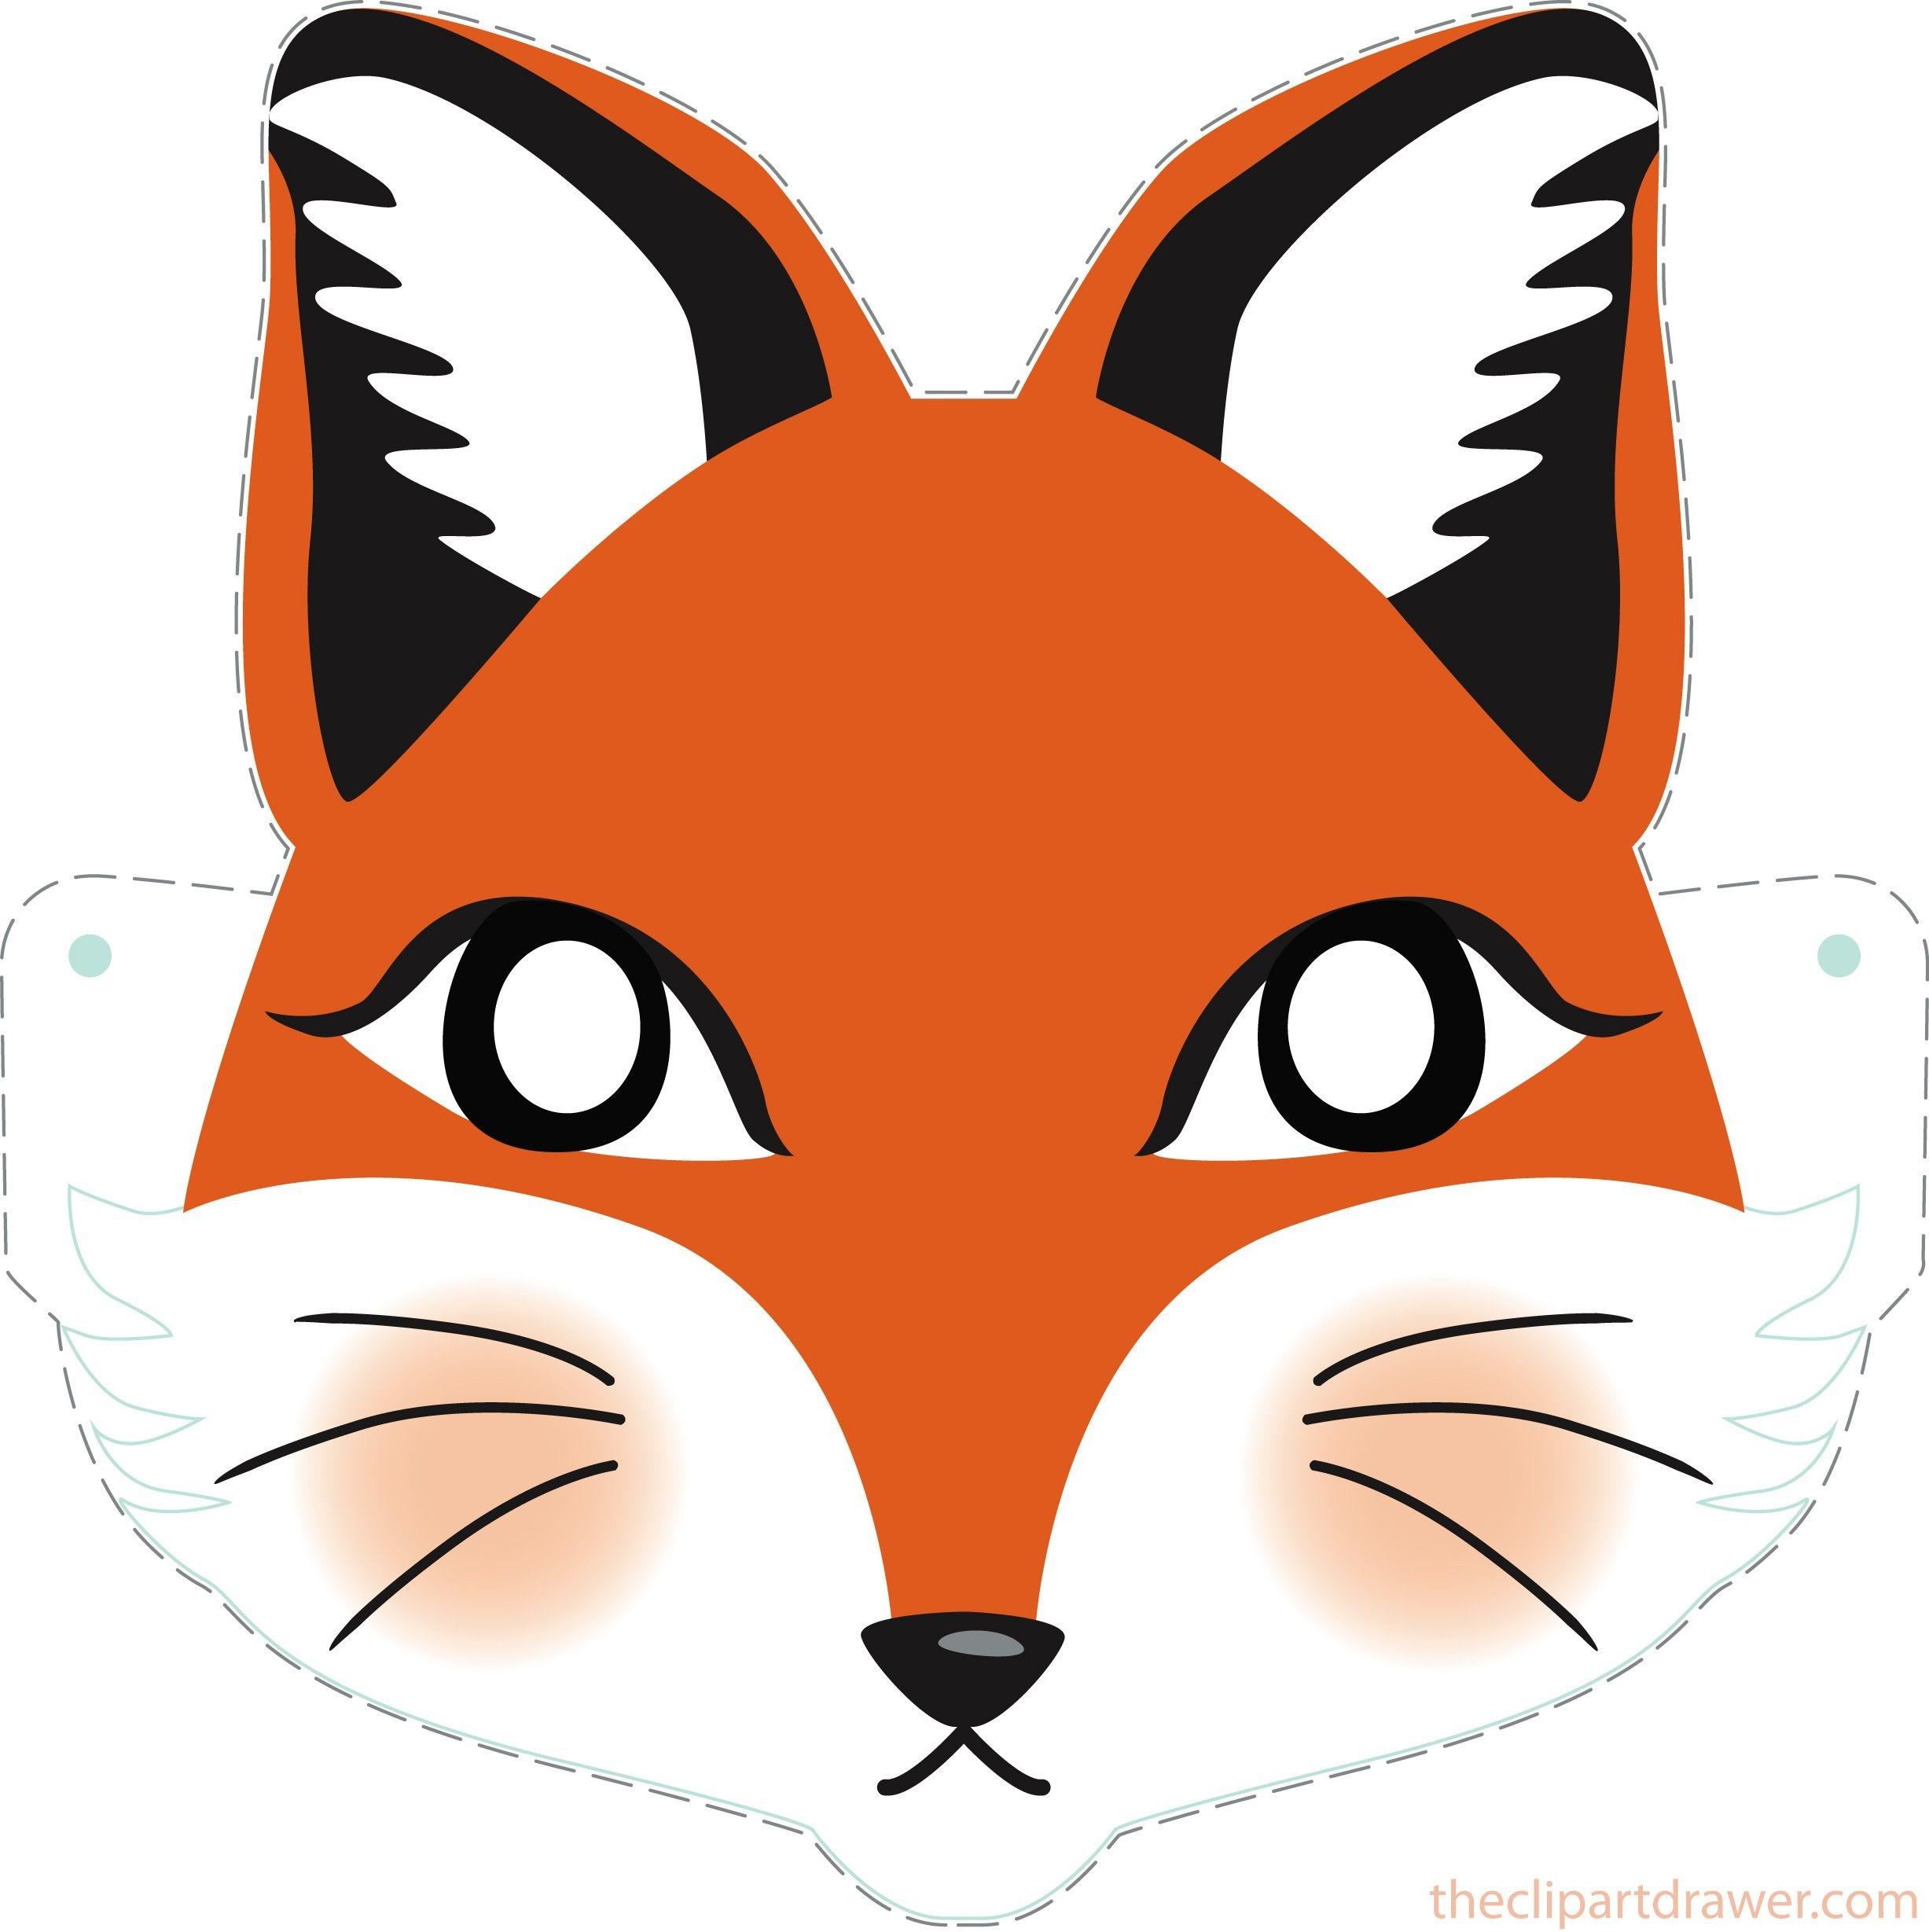 Diy Fox Printable Mask For Kids - Clipart Drawer   Diy   Printable - Free Printable Fox Mask Template